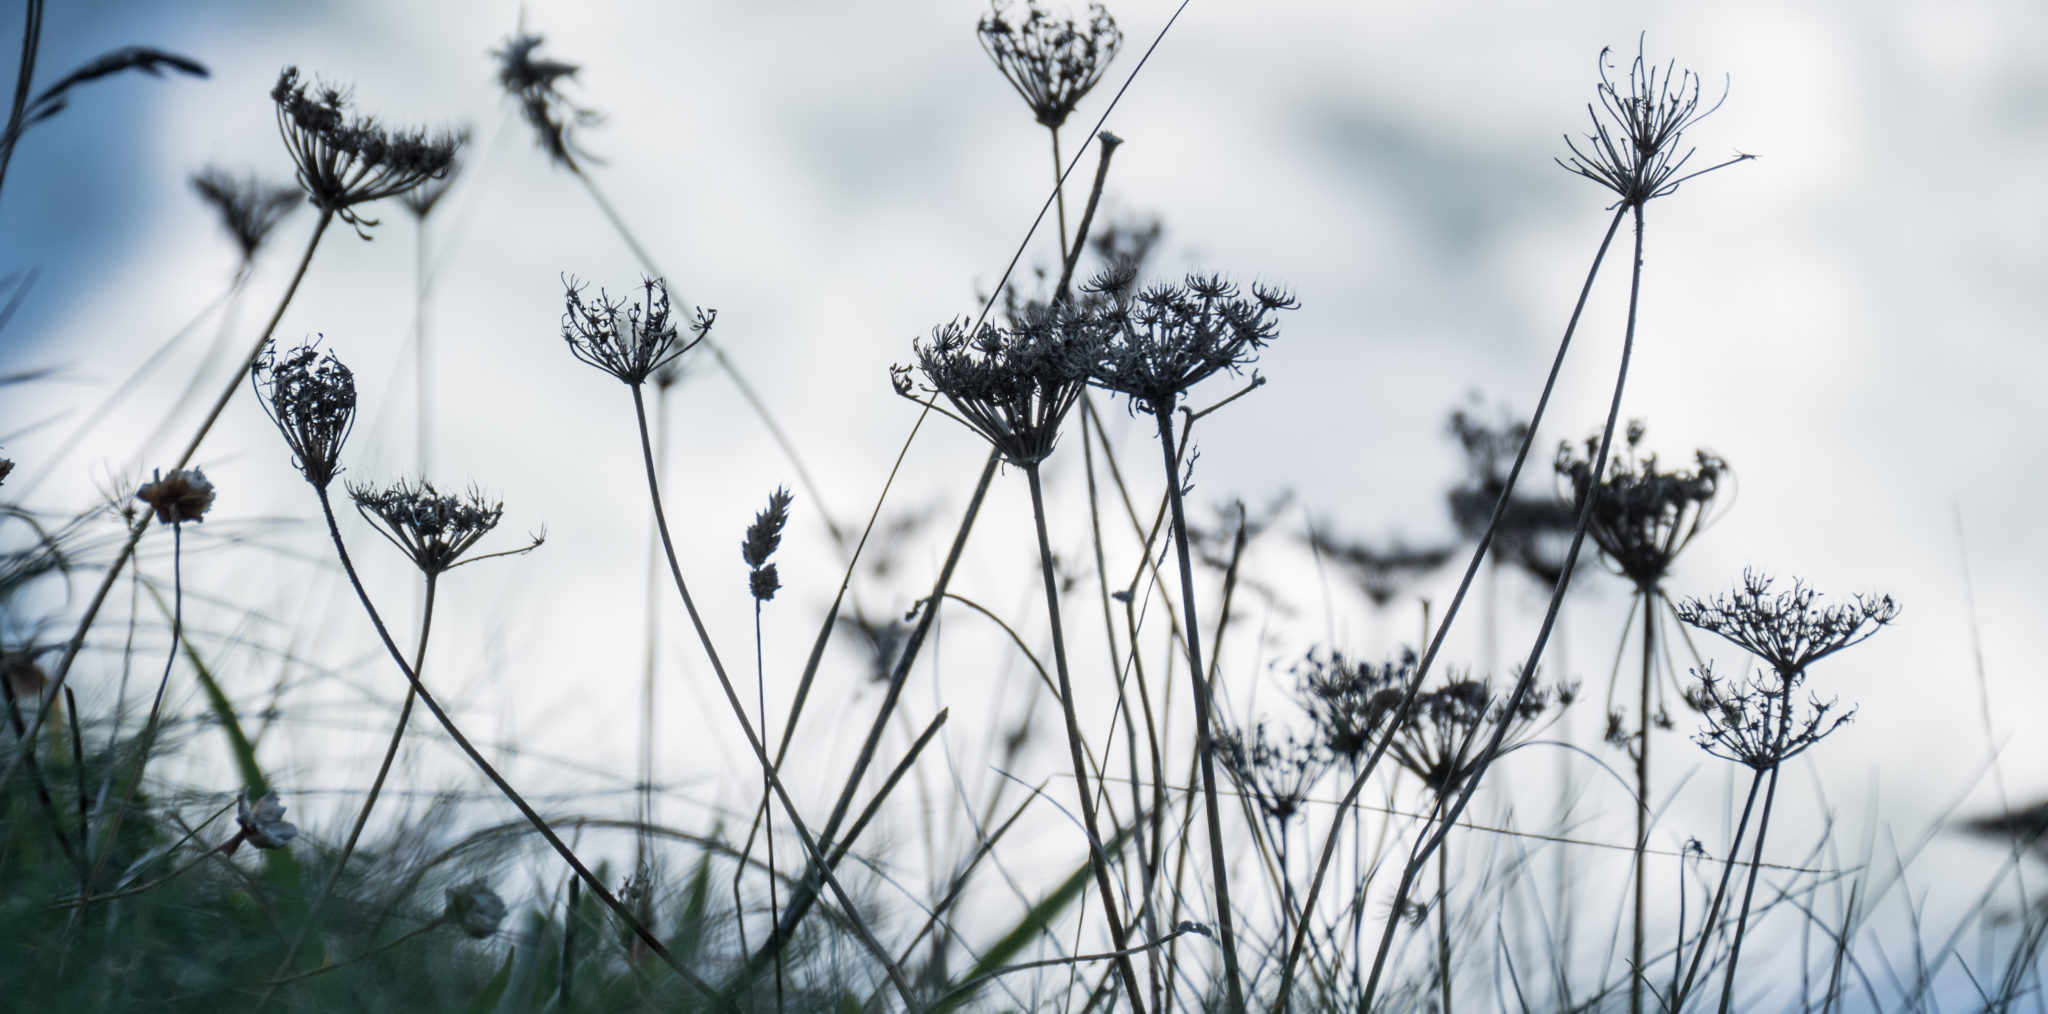 HJTC - Ademtherapie - bloemenveld